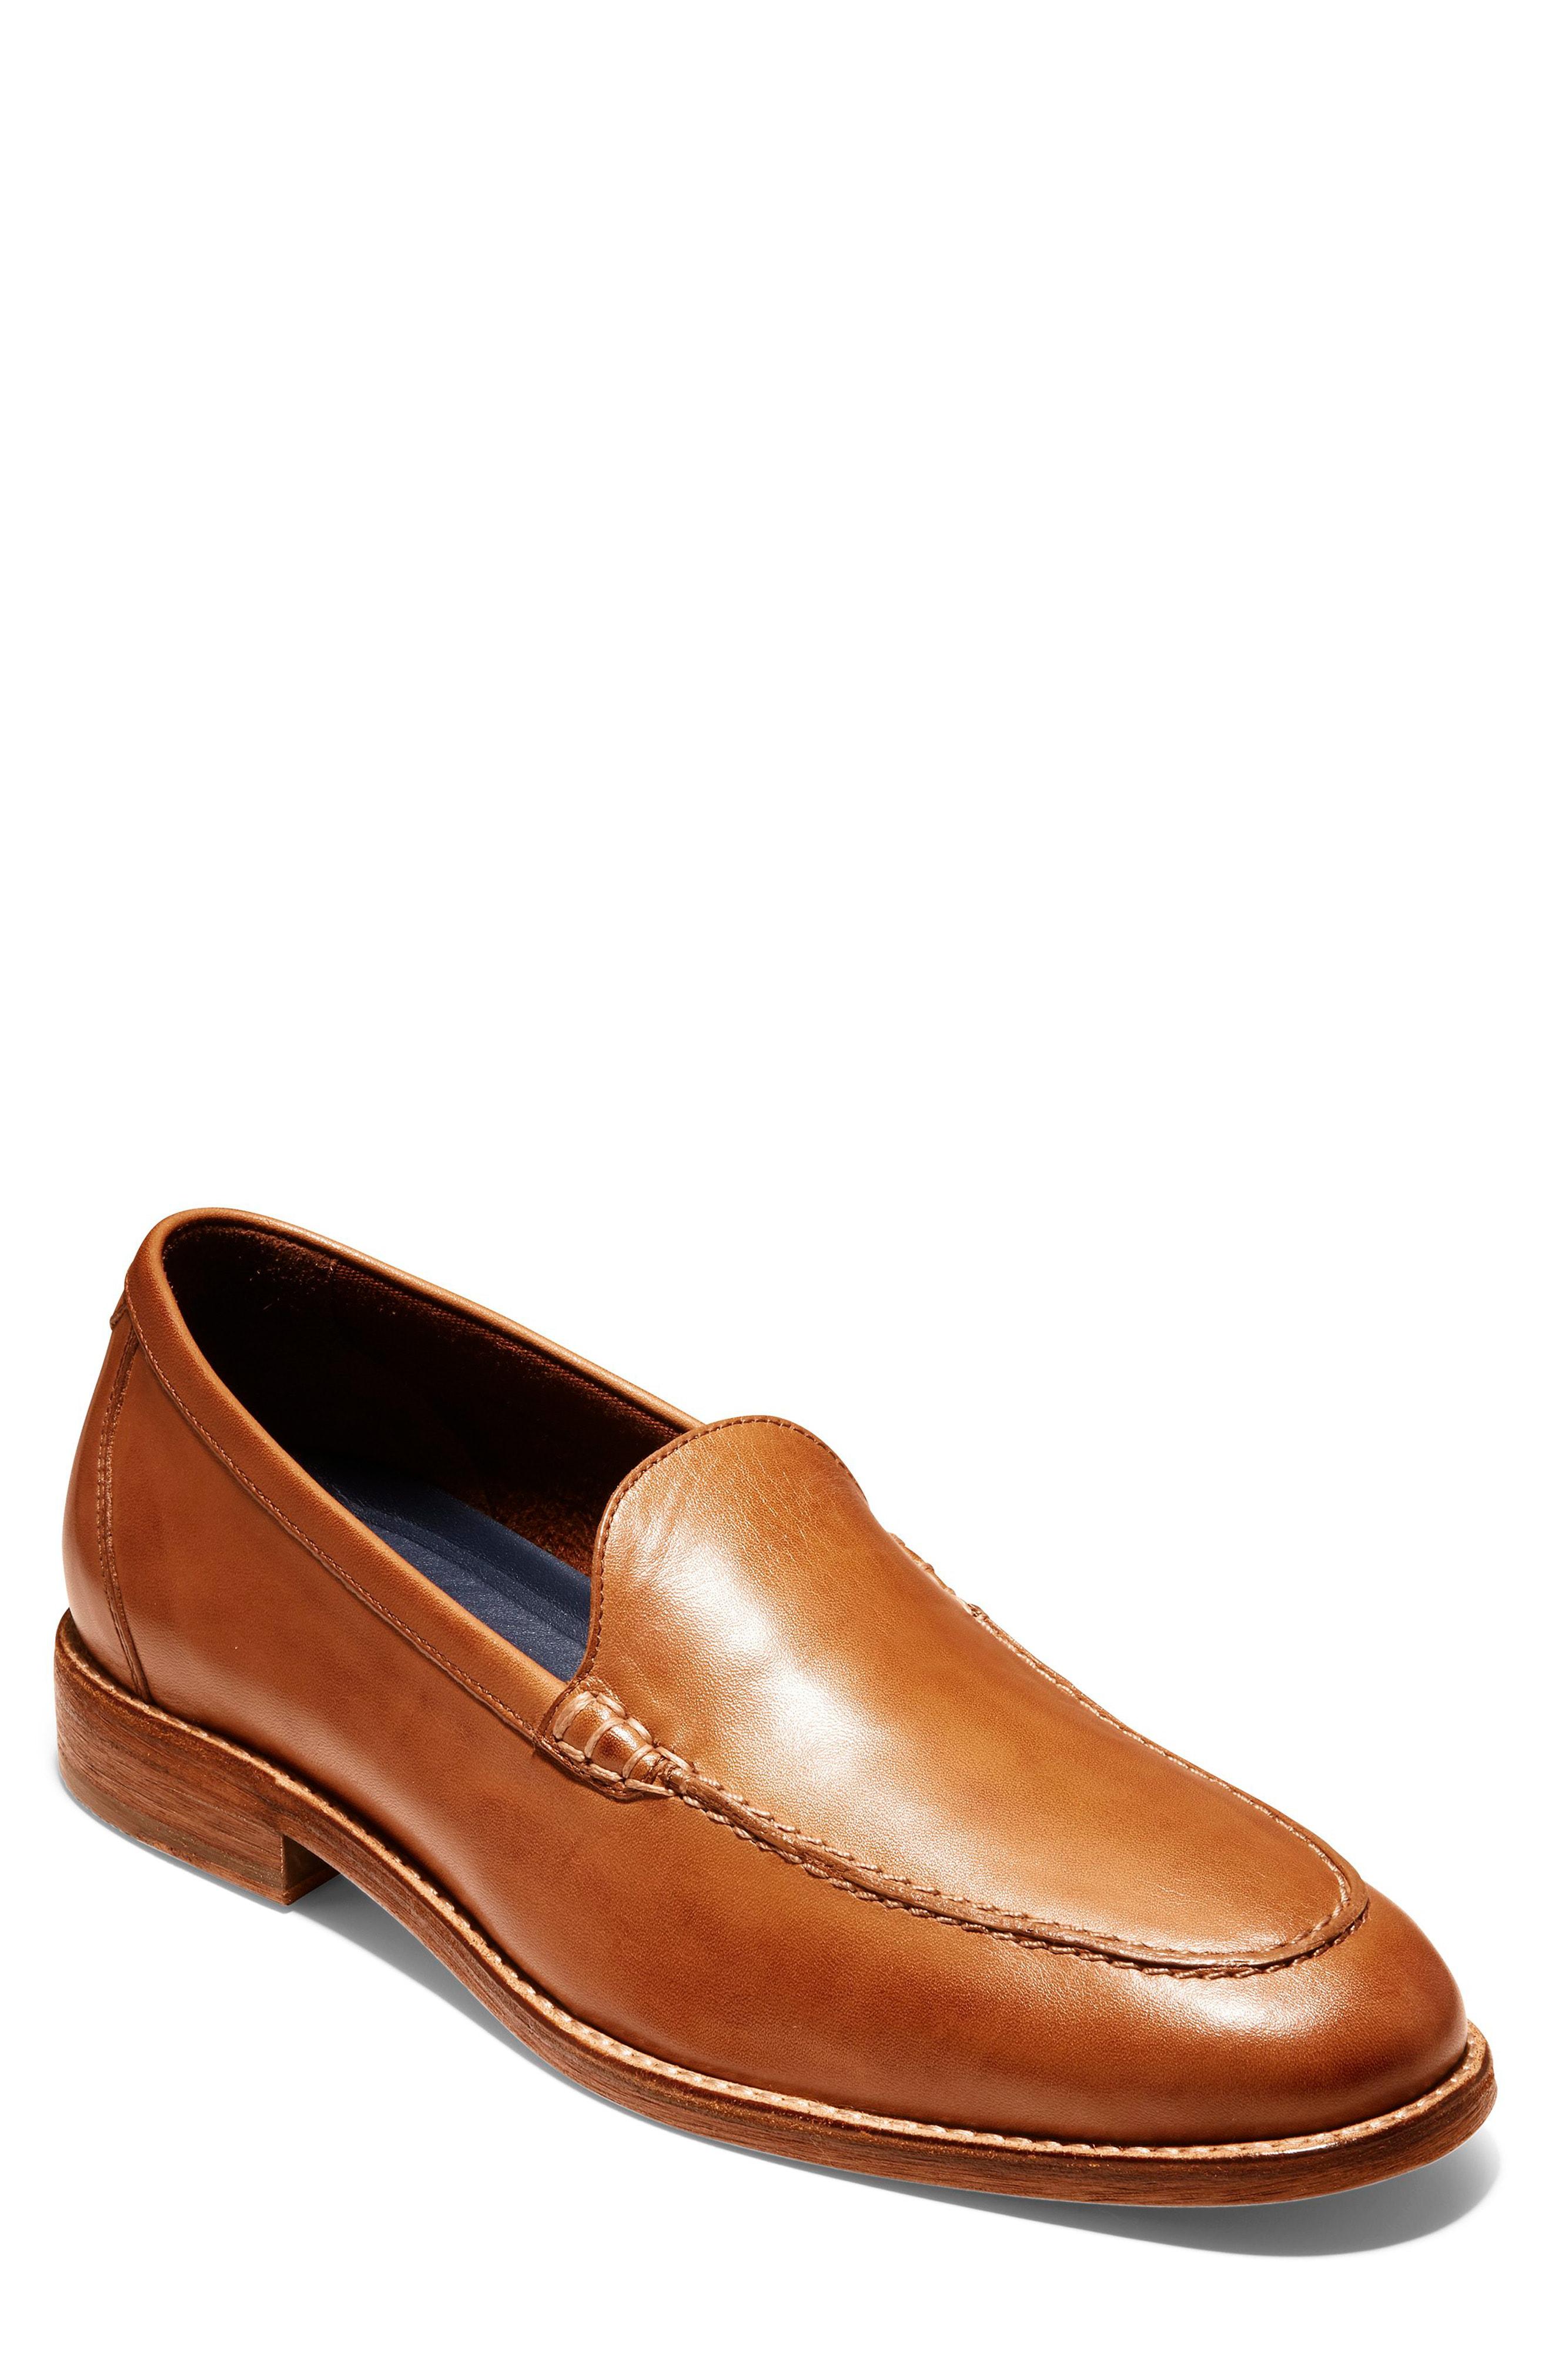 4388b6162cd Cole Haan Men s Feathercraft Grand Venetian Loafers Men s Shoes In British  Tan